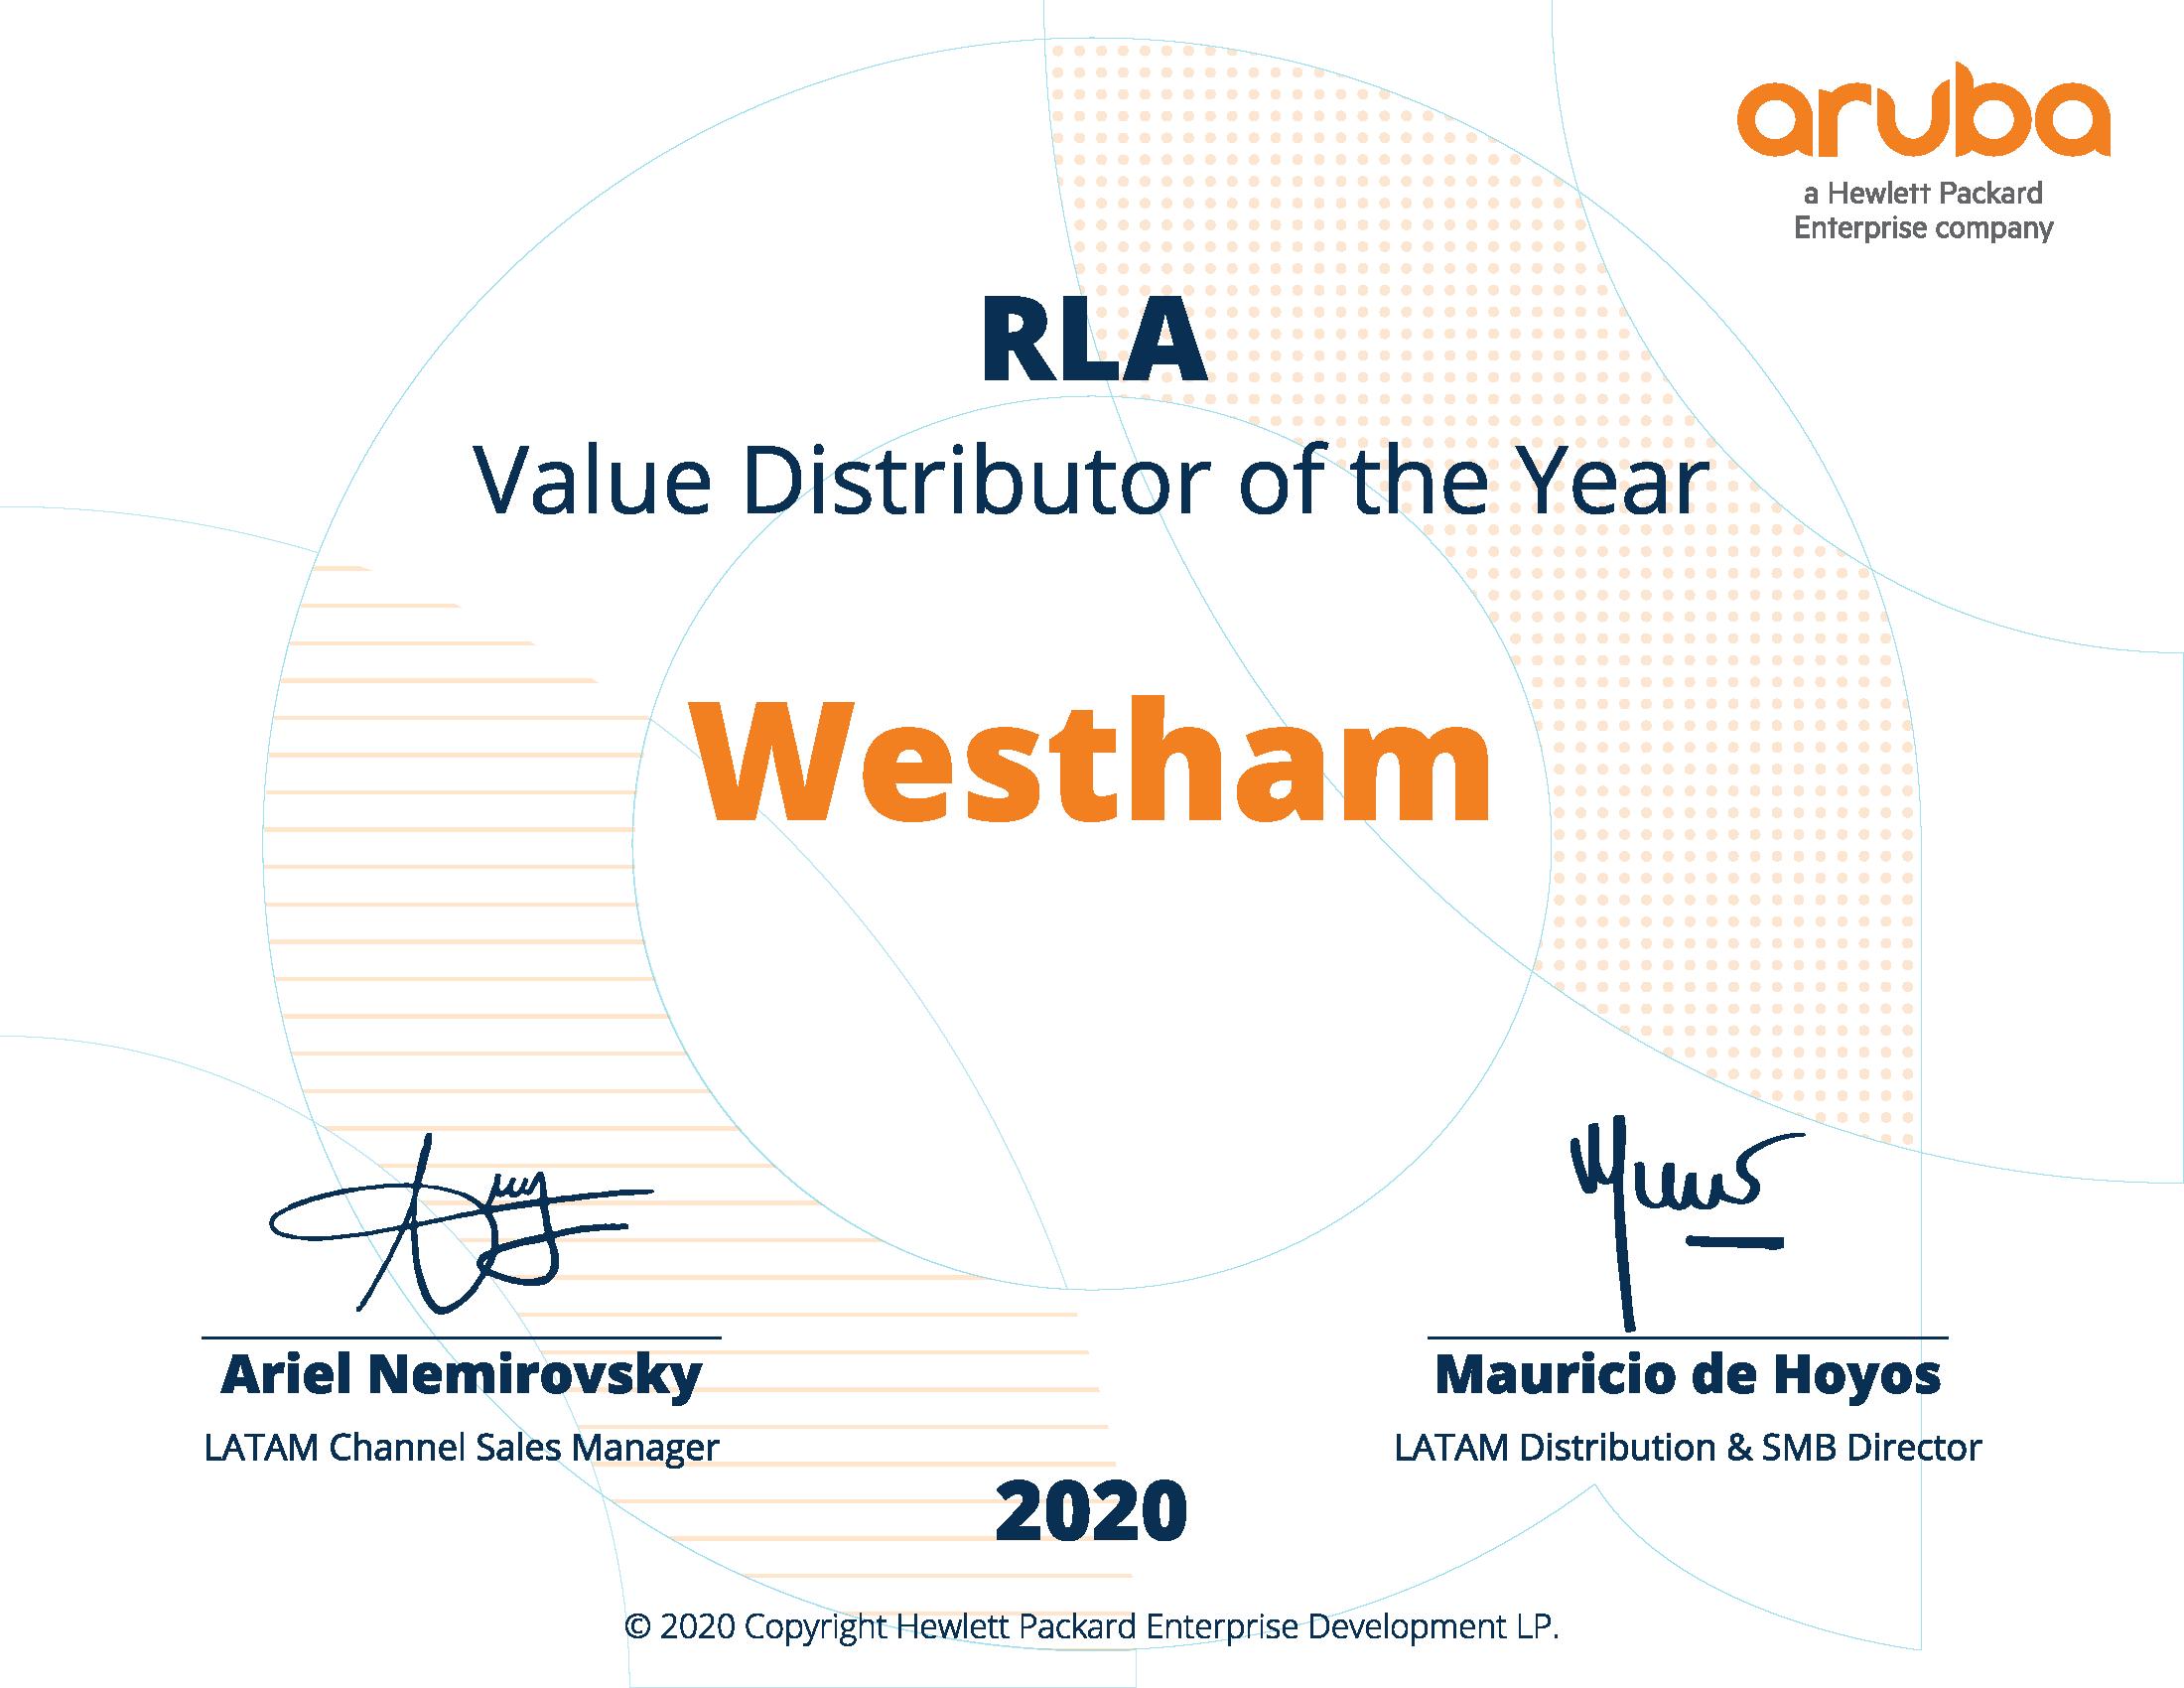 westham top value distributor for Aruba